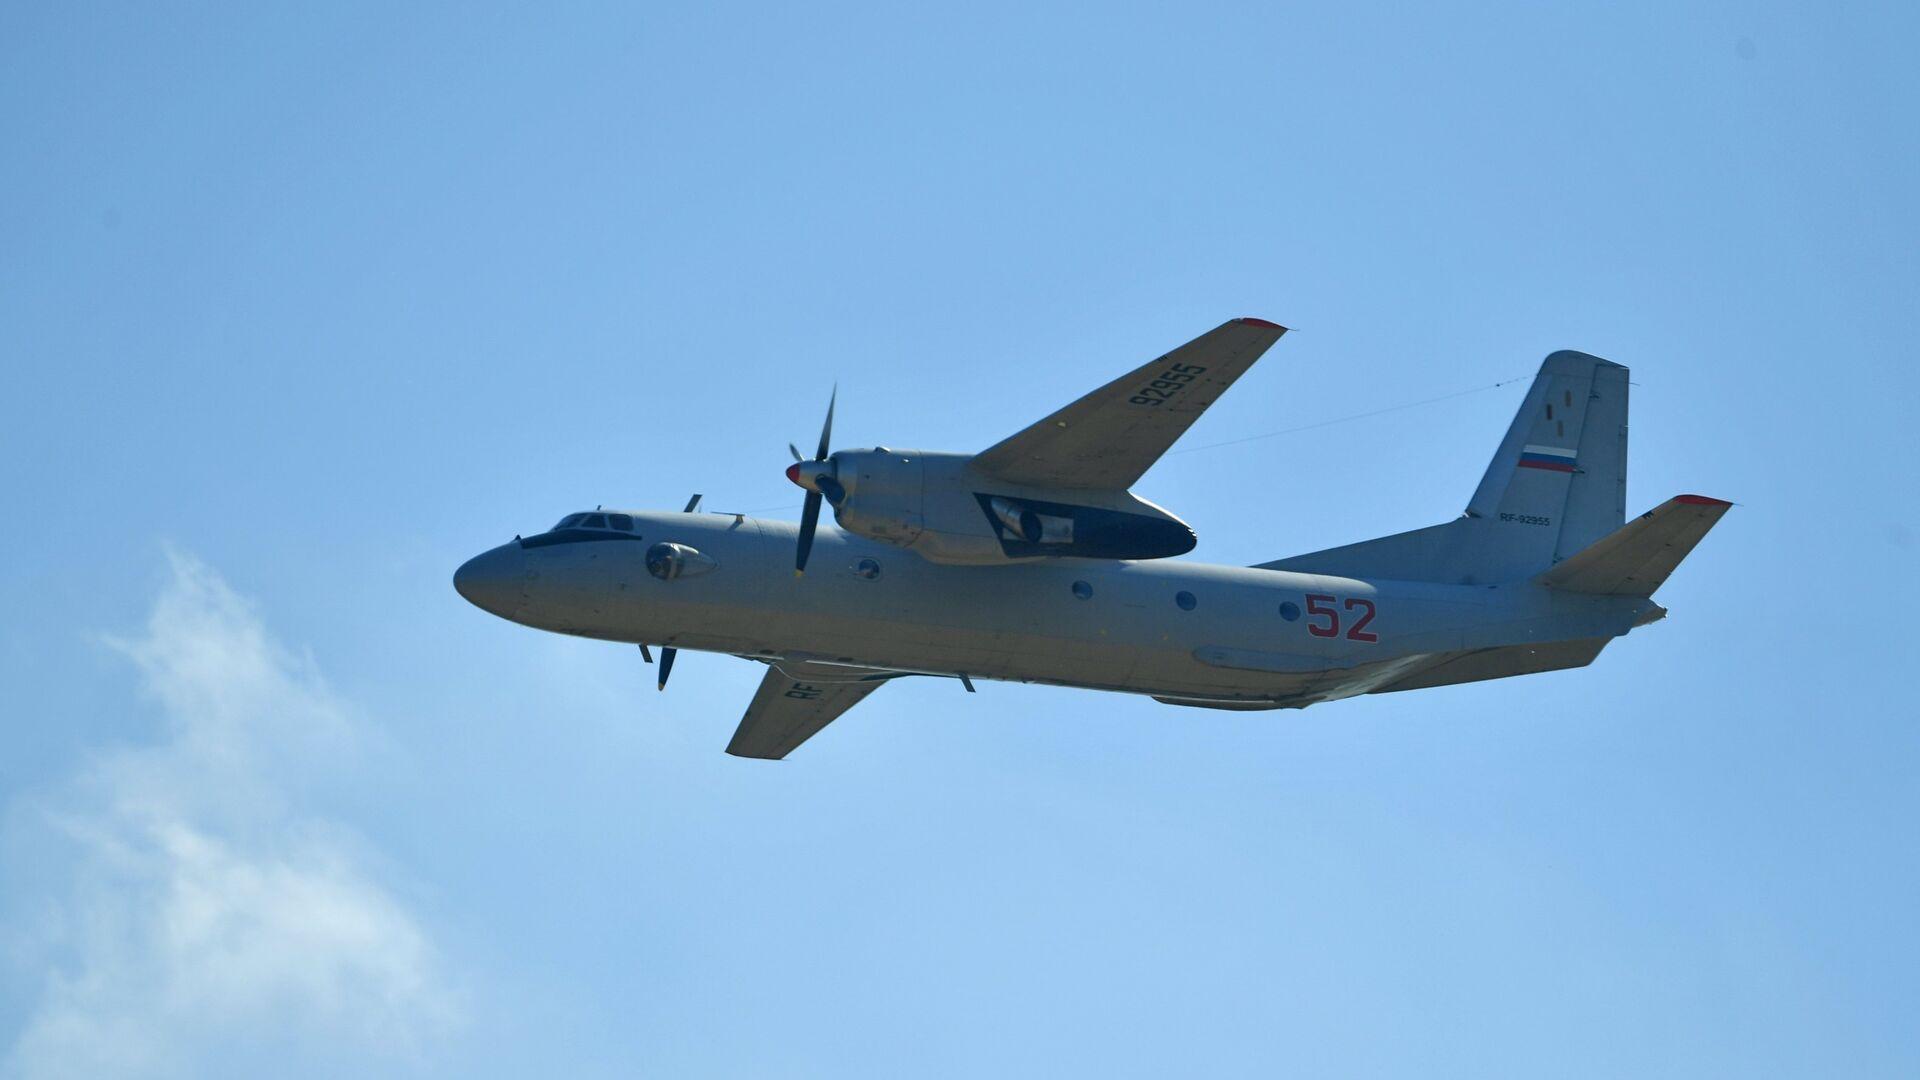 Avión militar ruso An-26 - Sputnik Mundo, 1920, 23.09.2021